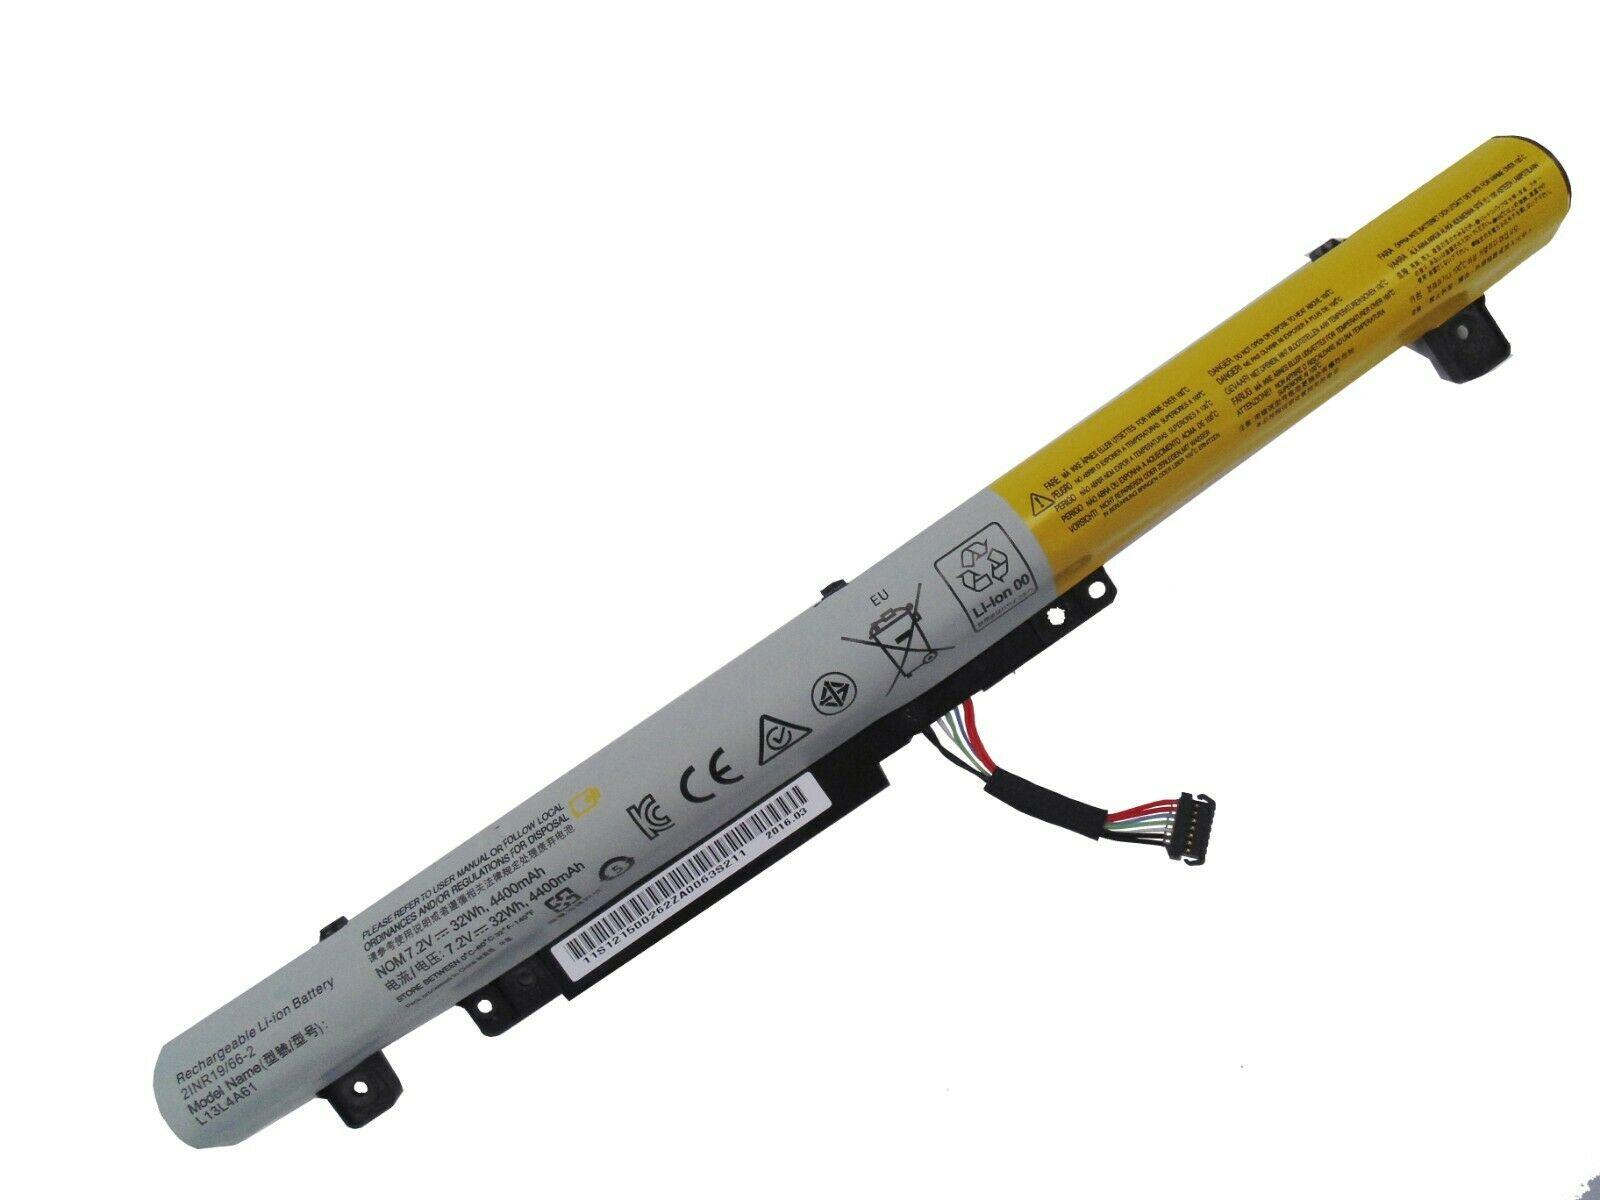 Batterie pour L13M4E61 L13M4A61 L13L4A61 Lenovo Flex 2-14d 2-14 2-15(compatible)